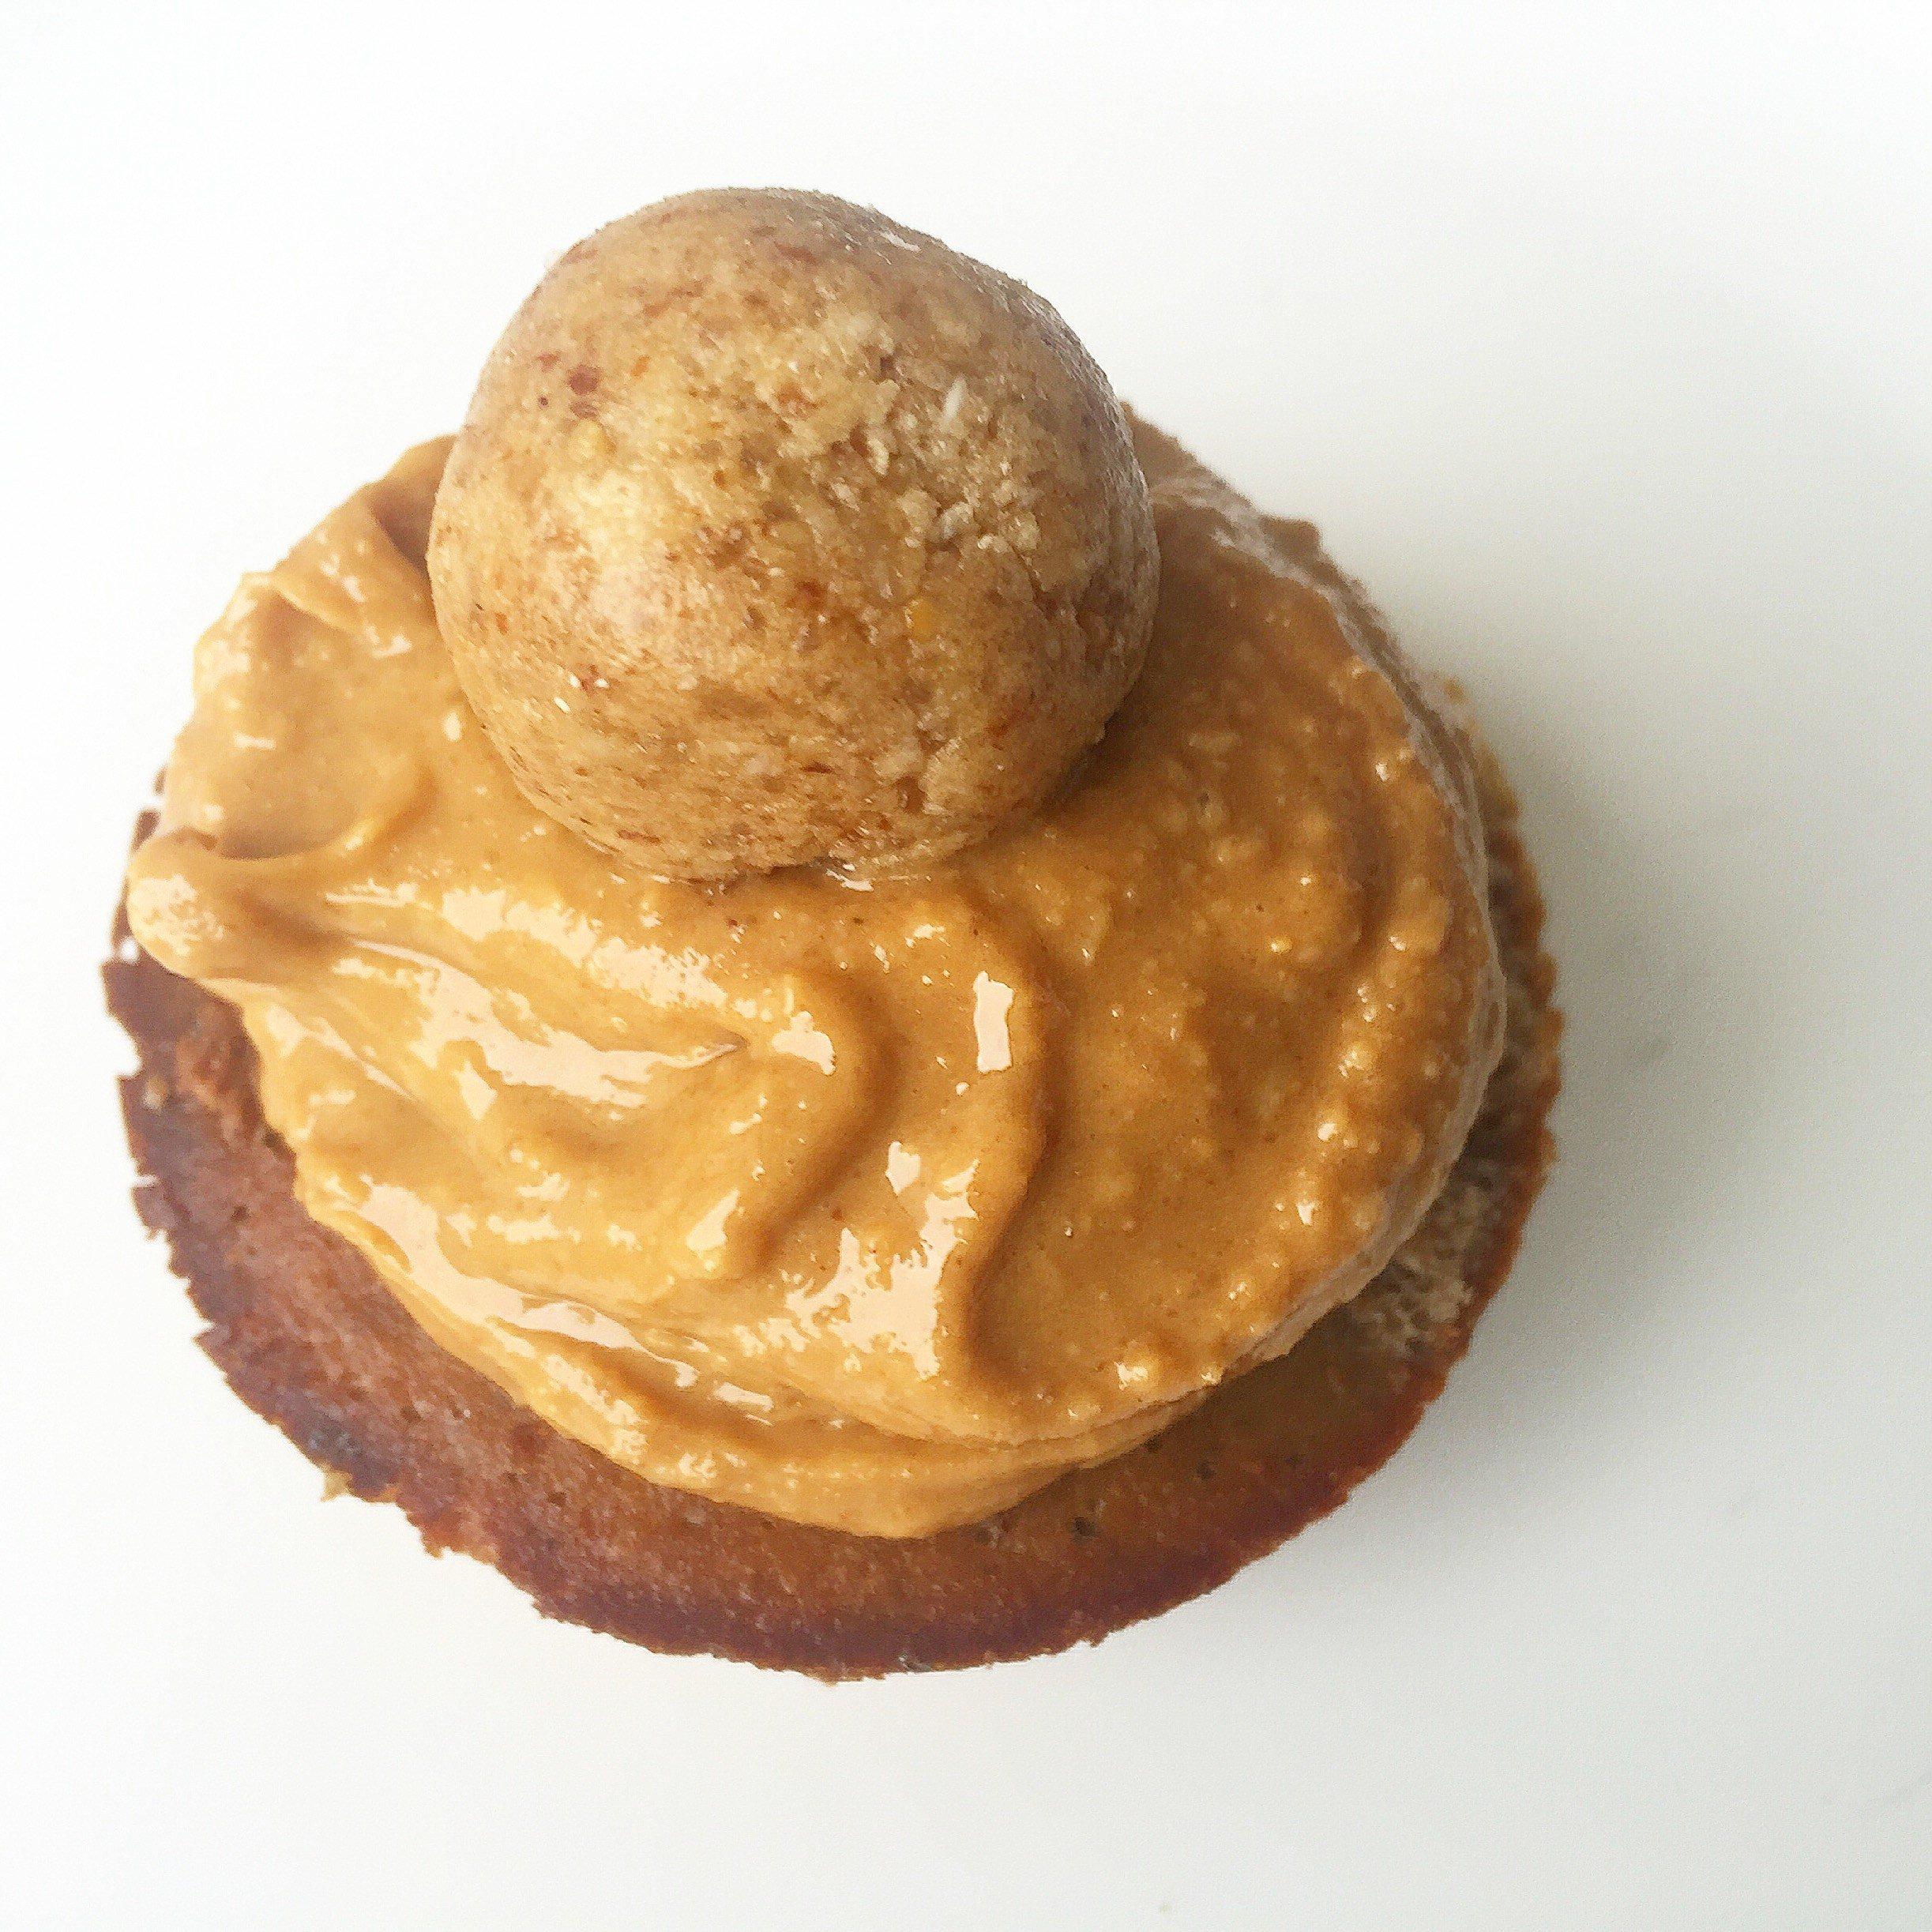 Kara's sugar free peanut butter